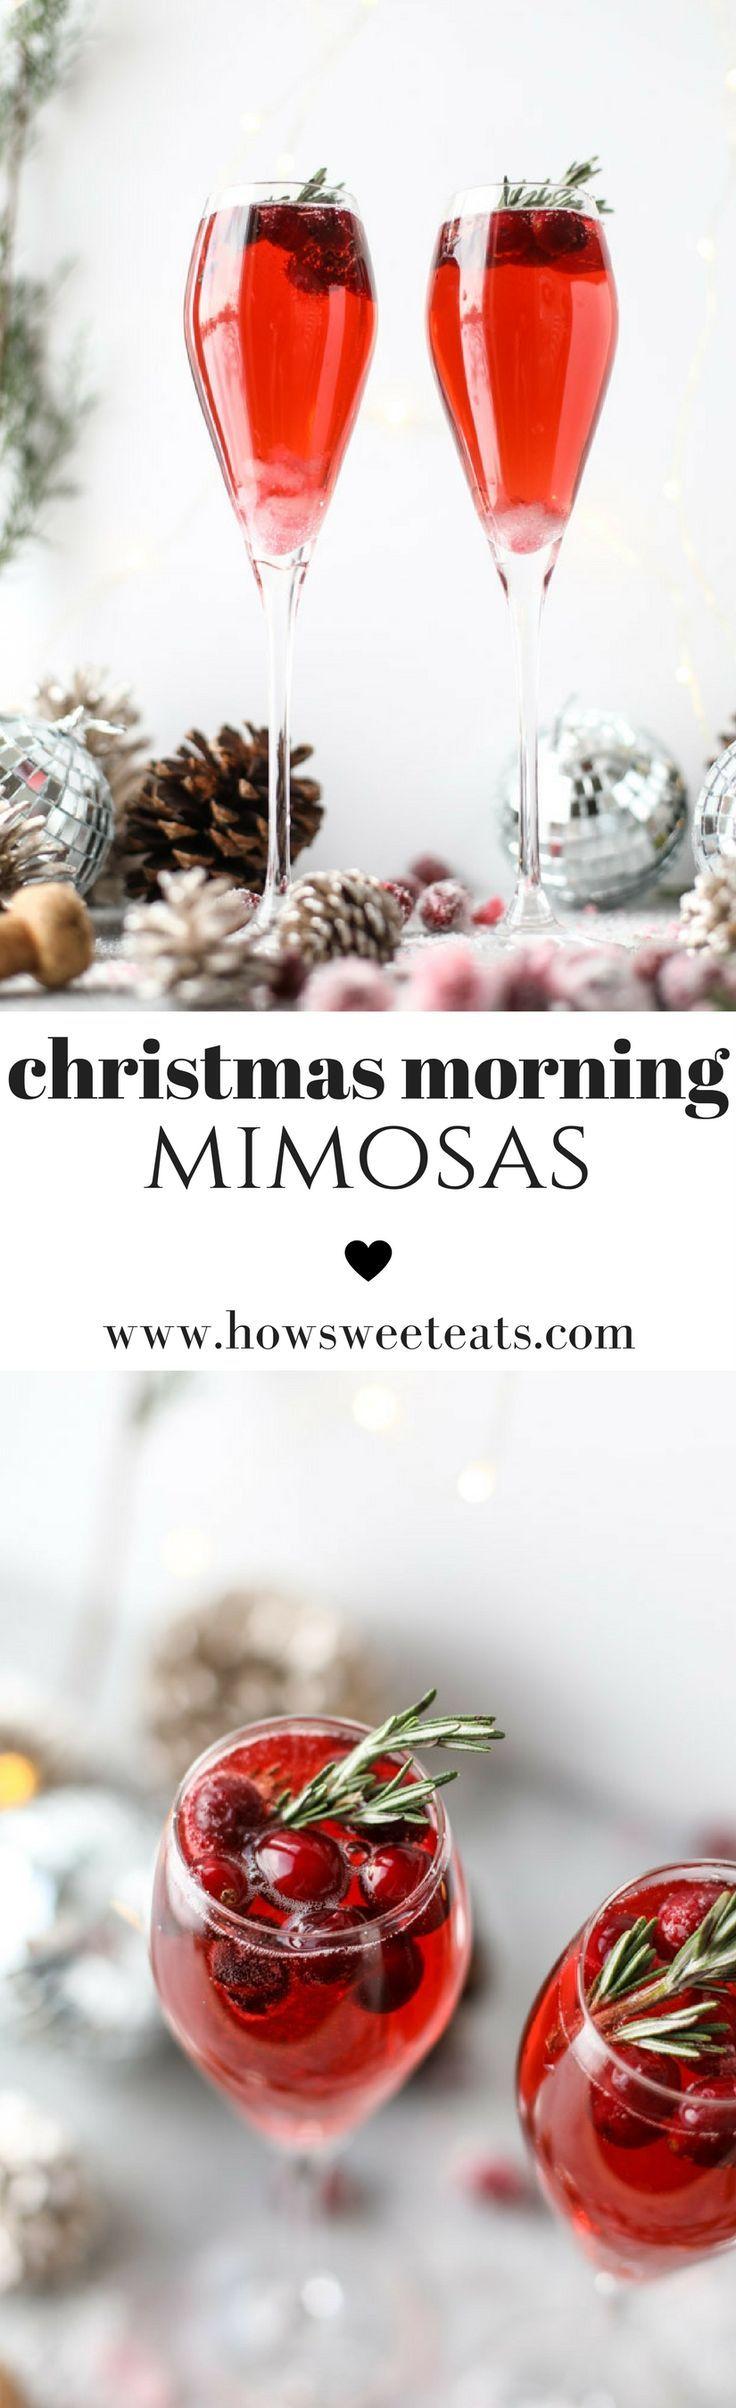 148 best Christmas Joy images on Pinterest | Merry christmas love ...